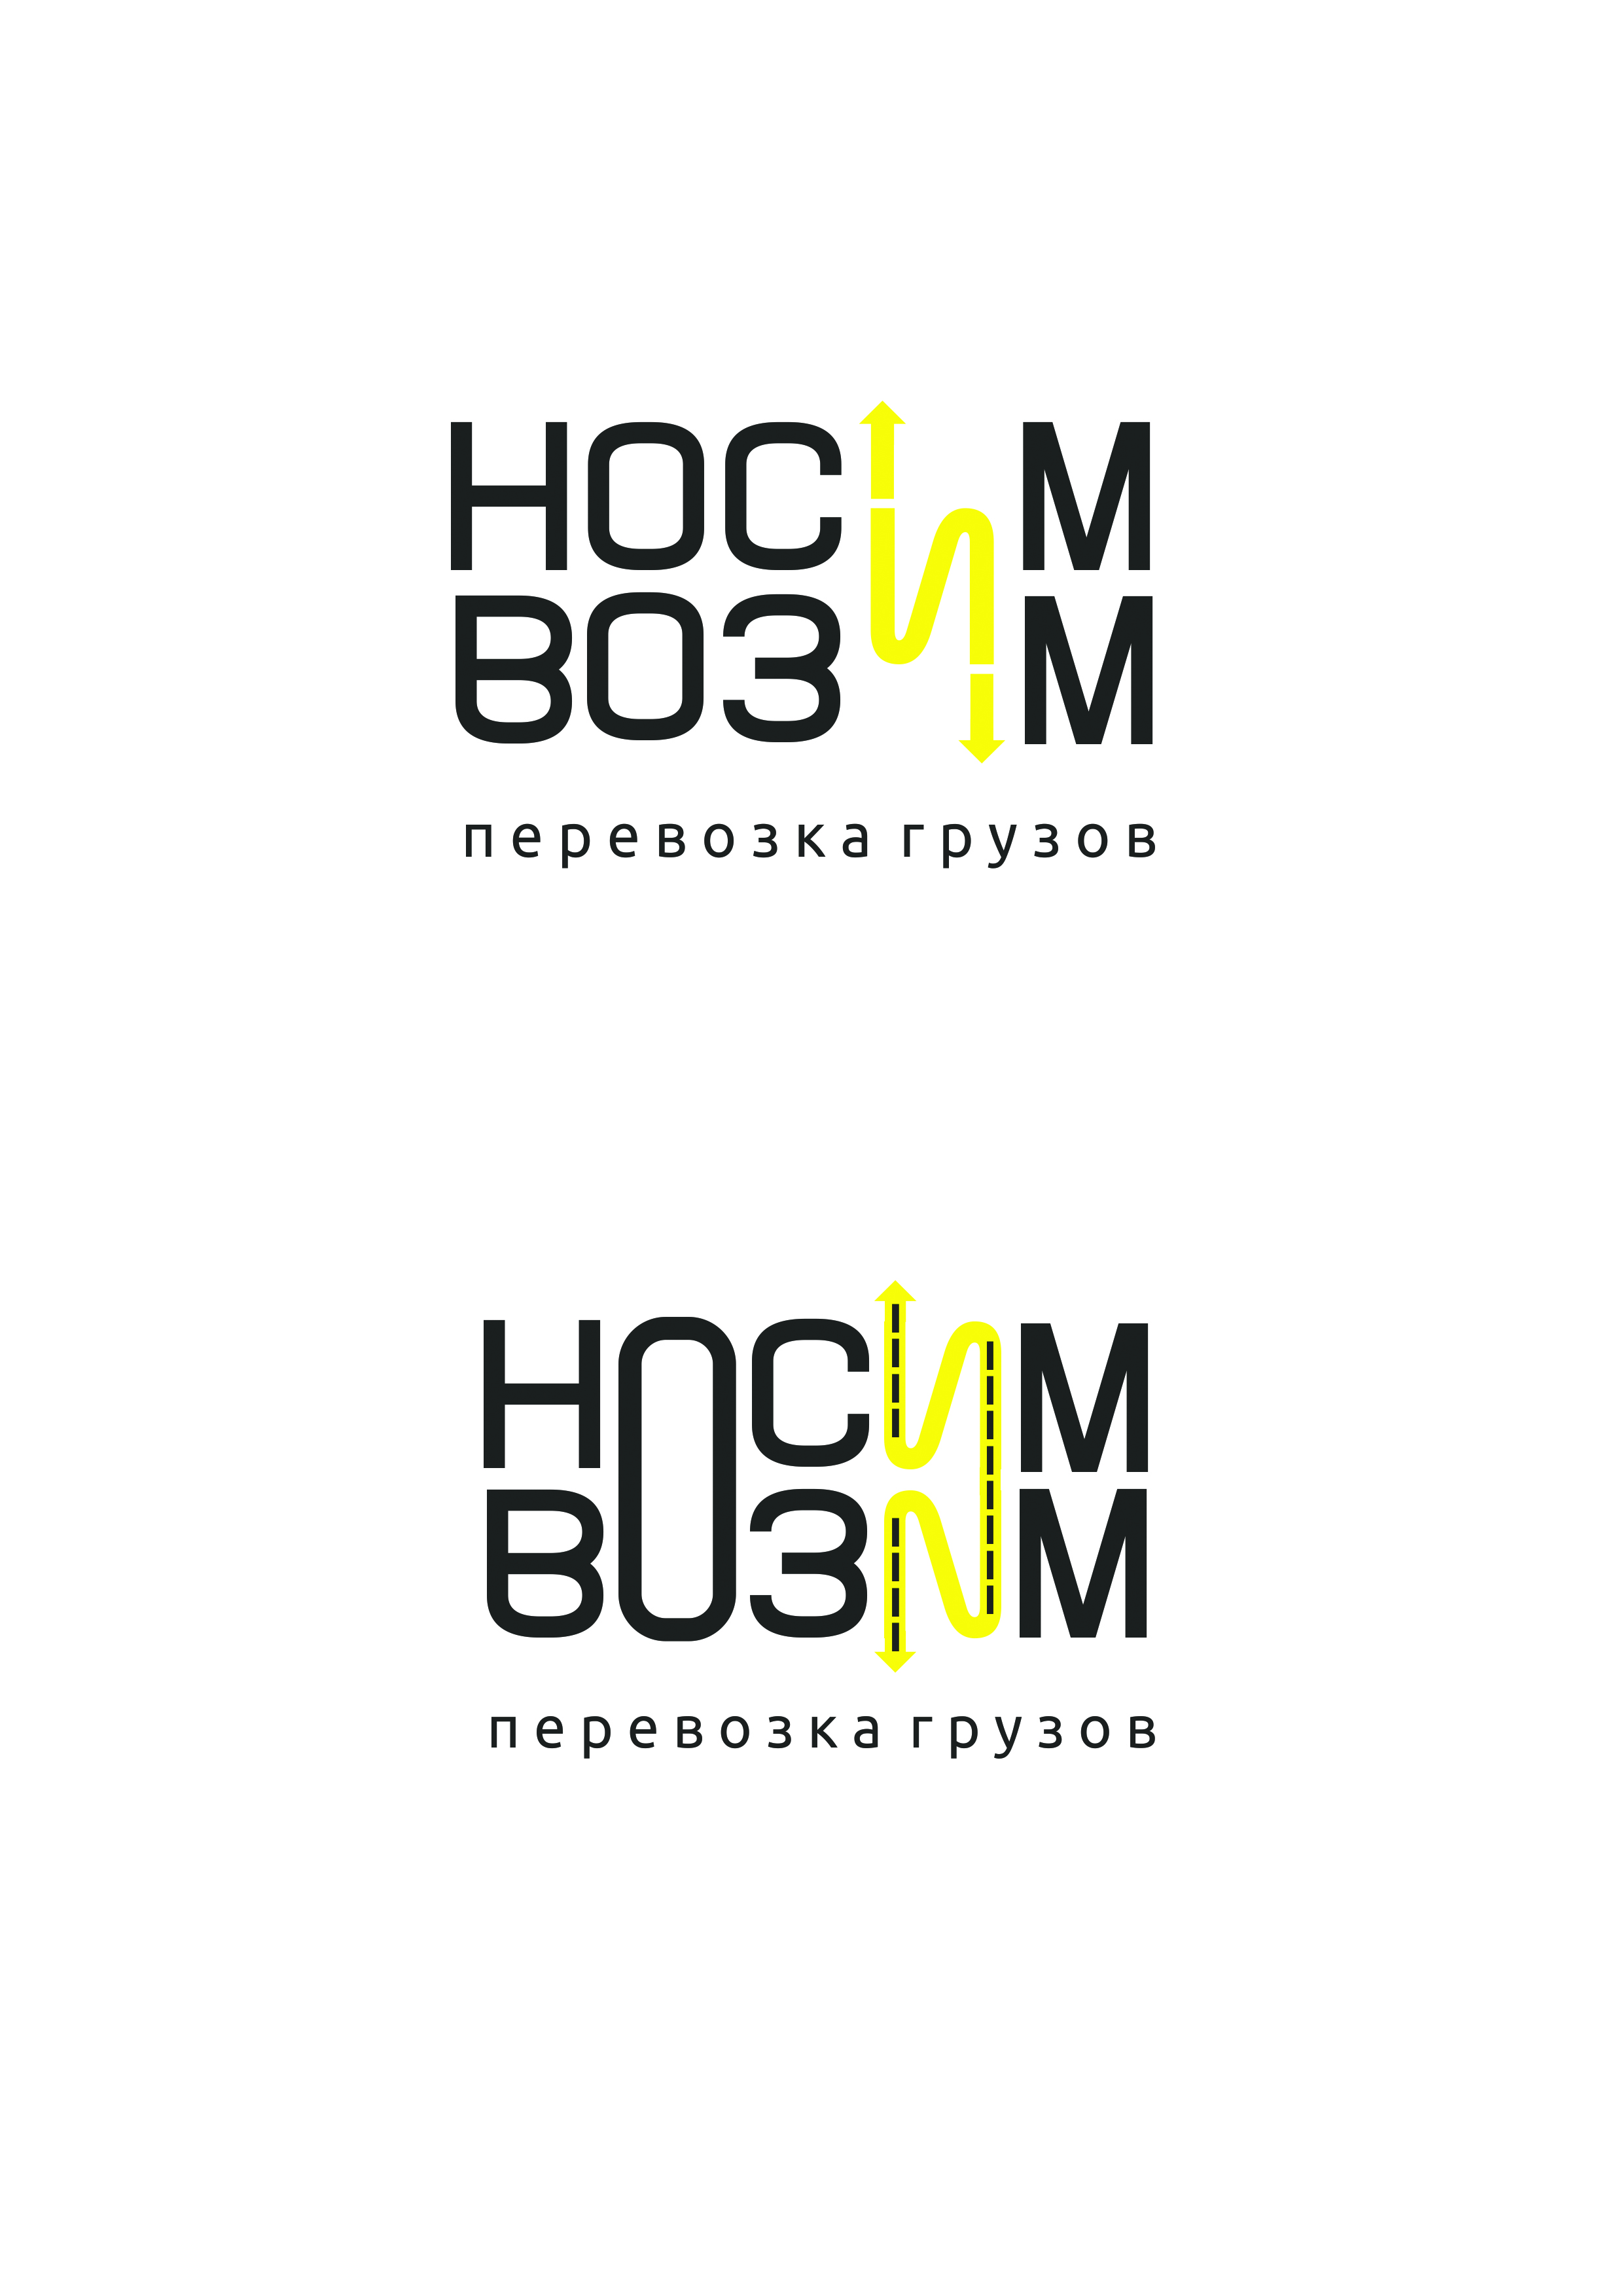 Логотип компании по перевозкам НосимВозим фото f_8005cf65fff10b16.jpg